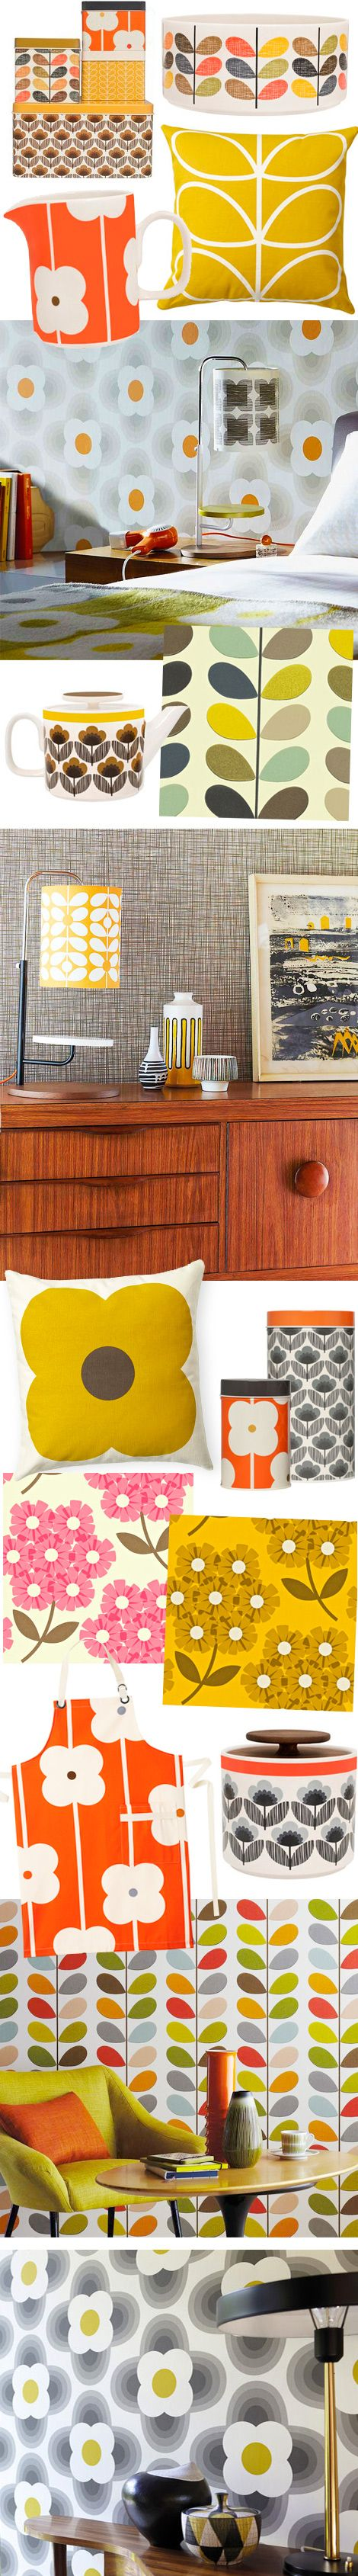 Orla Kiely's behangpapier en homeware collectie in België / www.woonblog.be